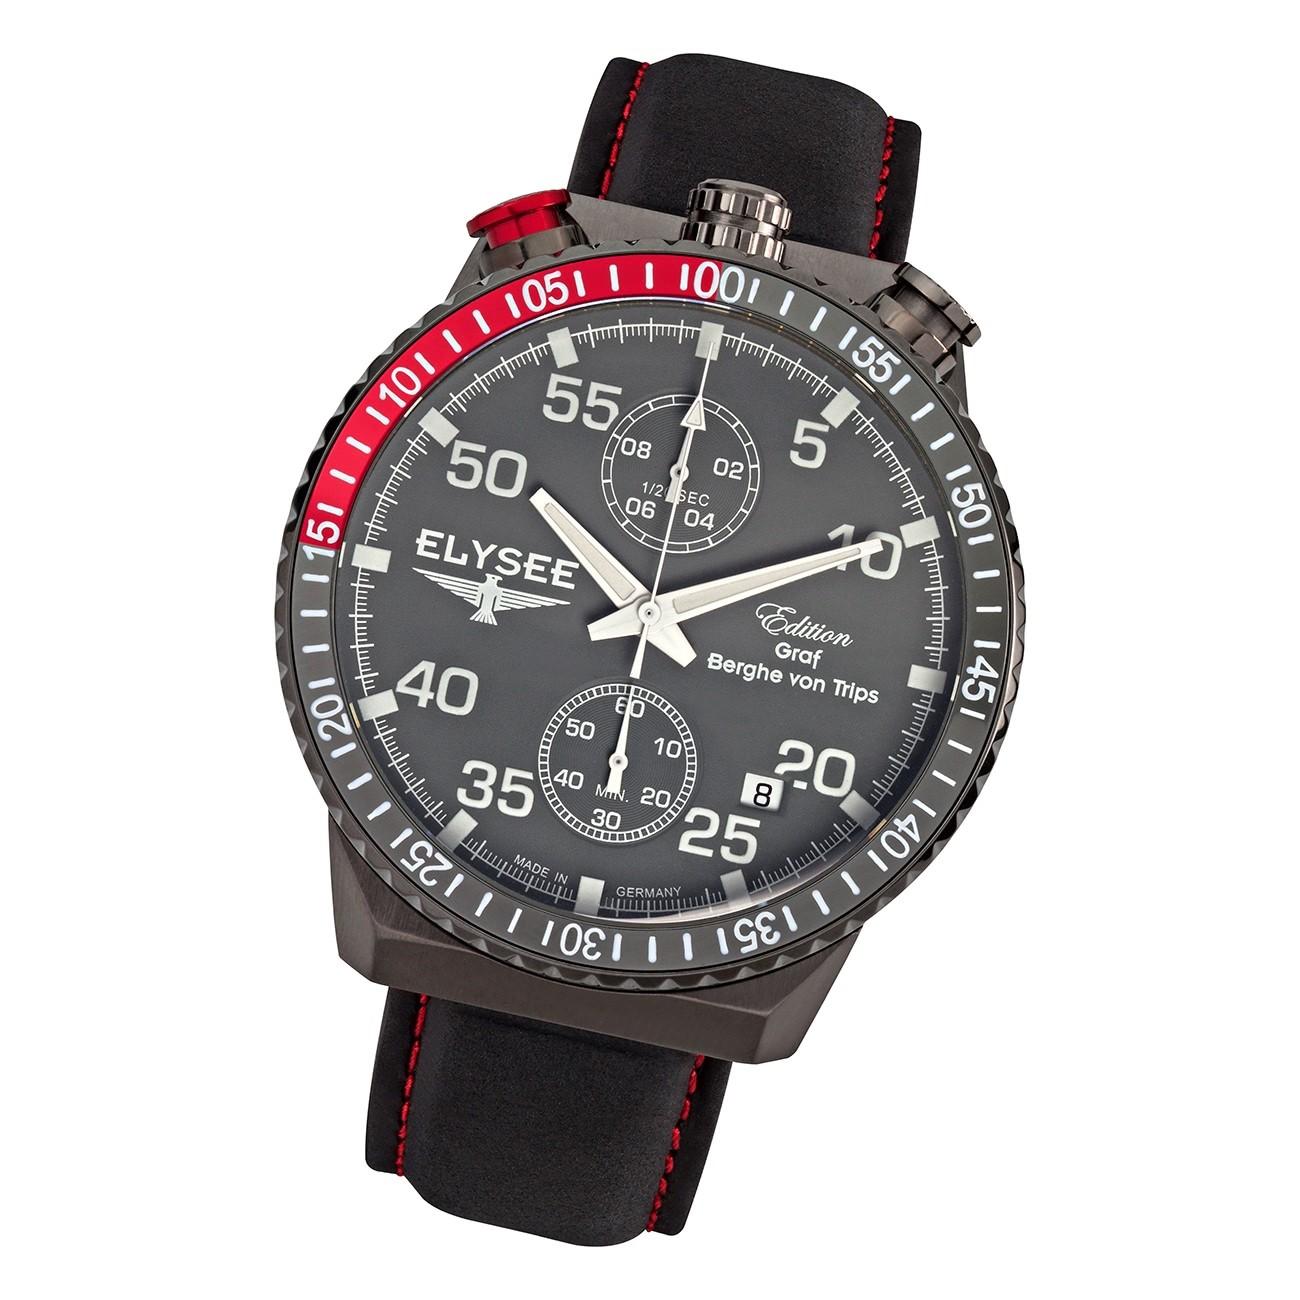 Elysee Herren Armbanduhr Rally Timer 80517 Chrono Leder schwarz UYS80517